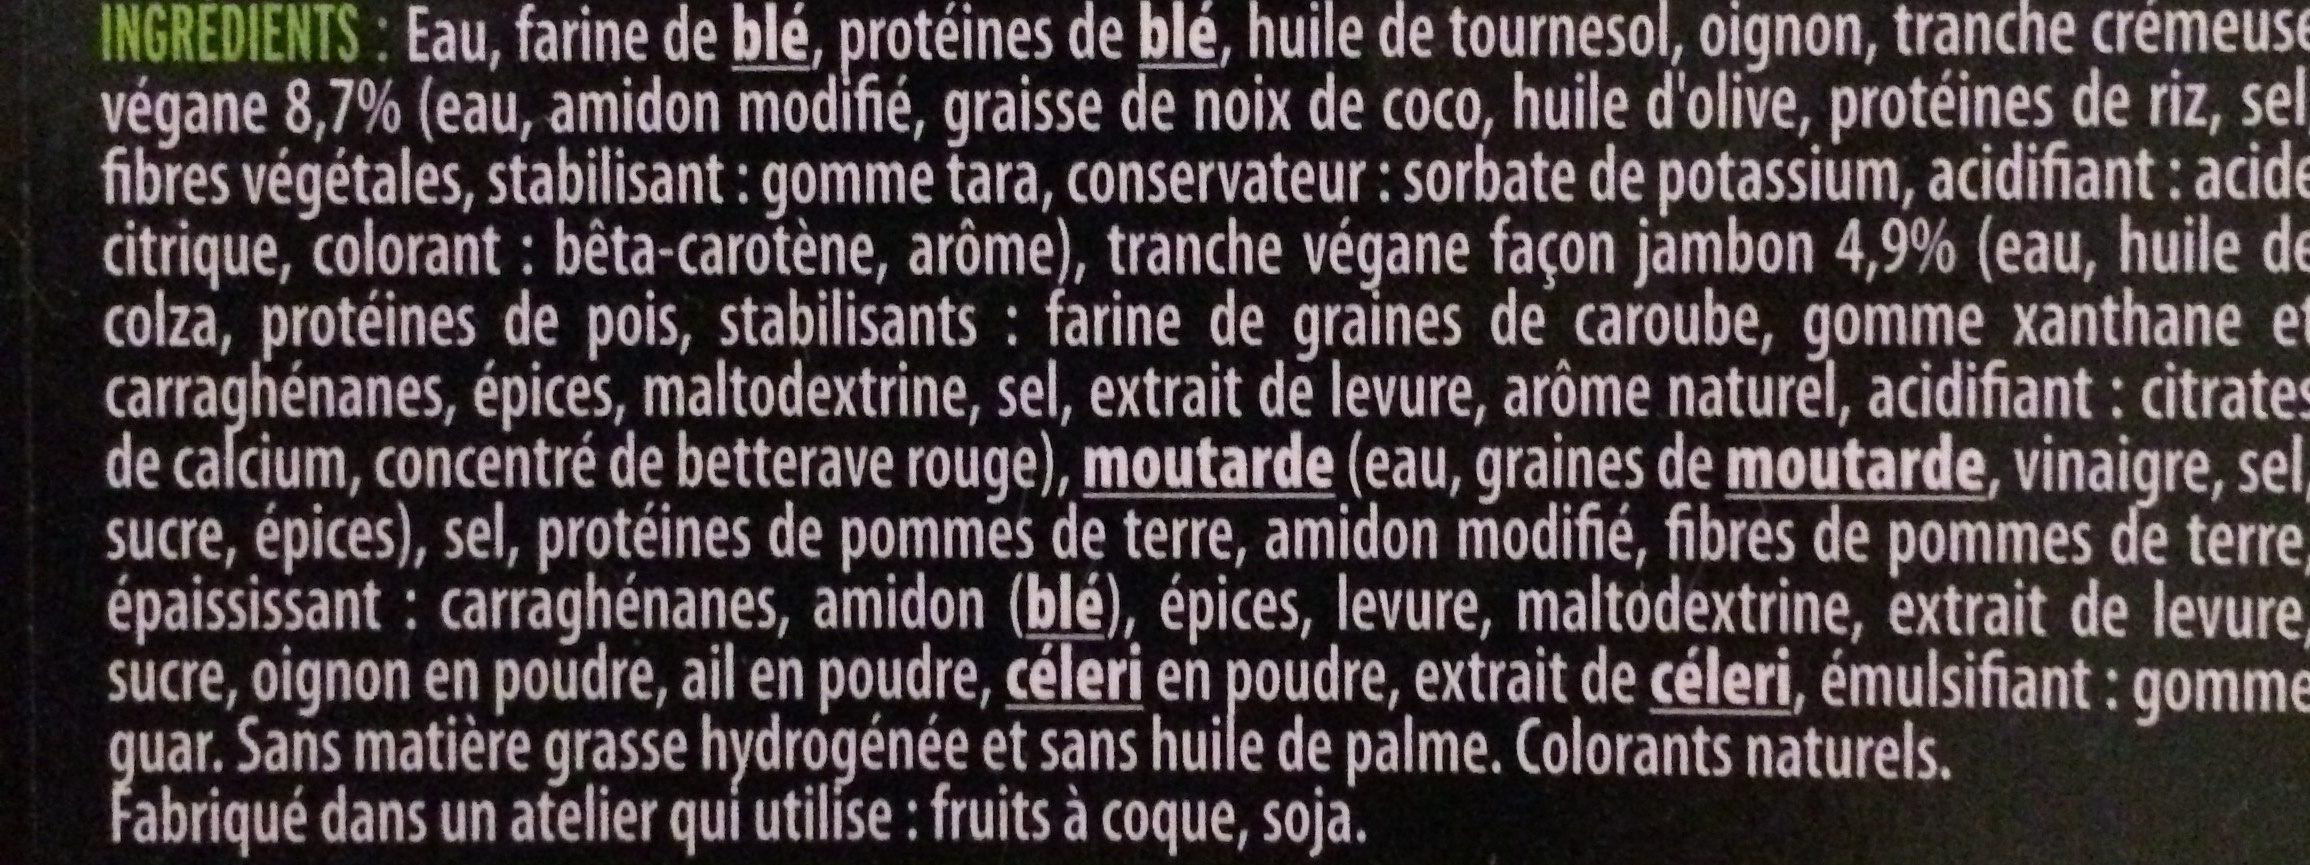 Cordon Bleu  Végétale - Ingrediënten - fr